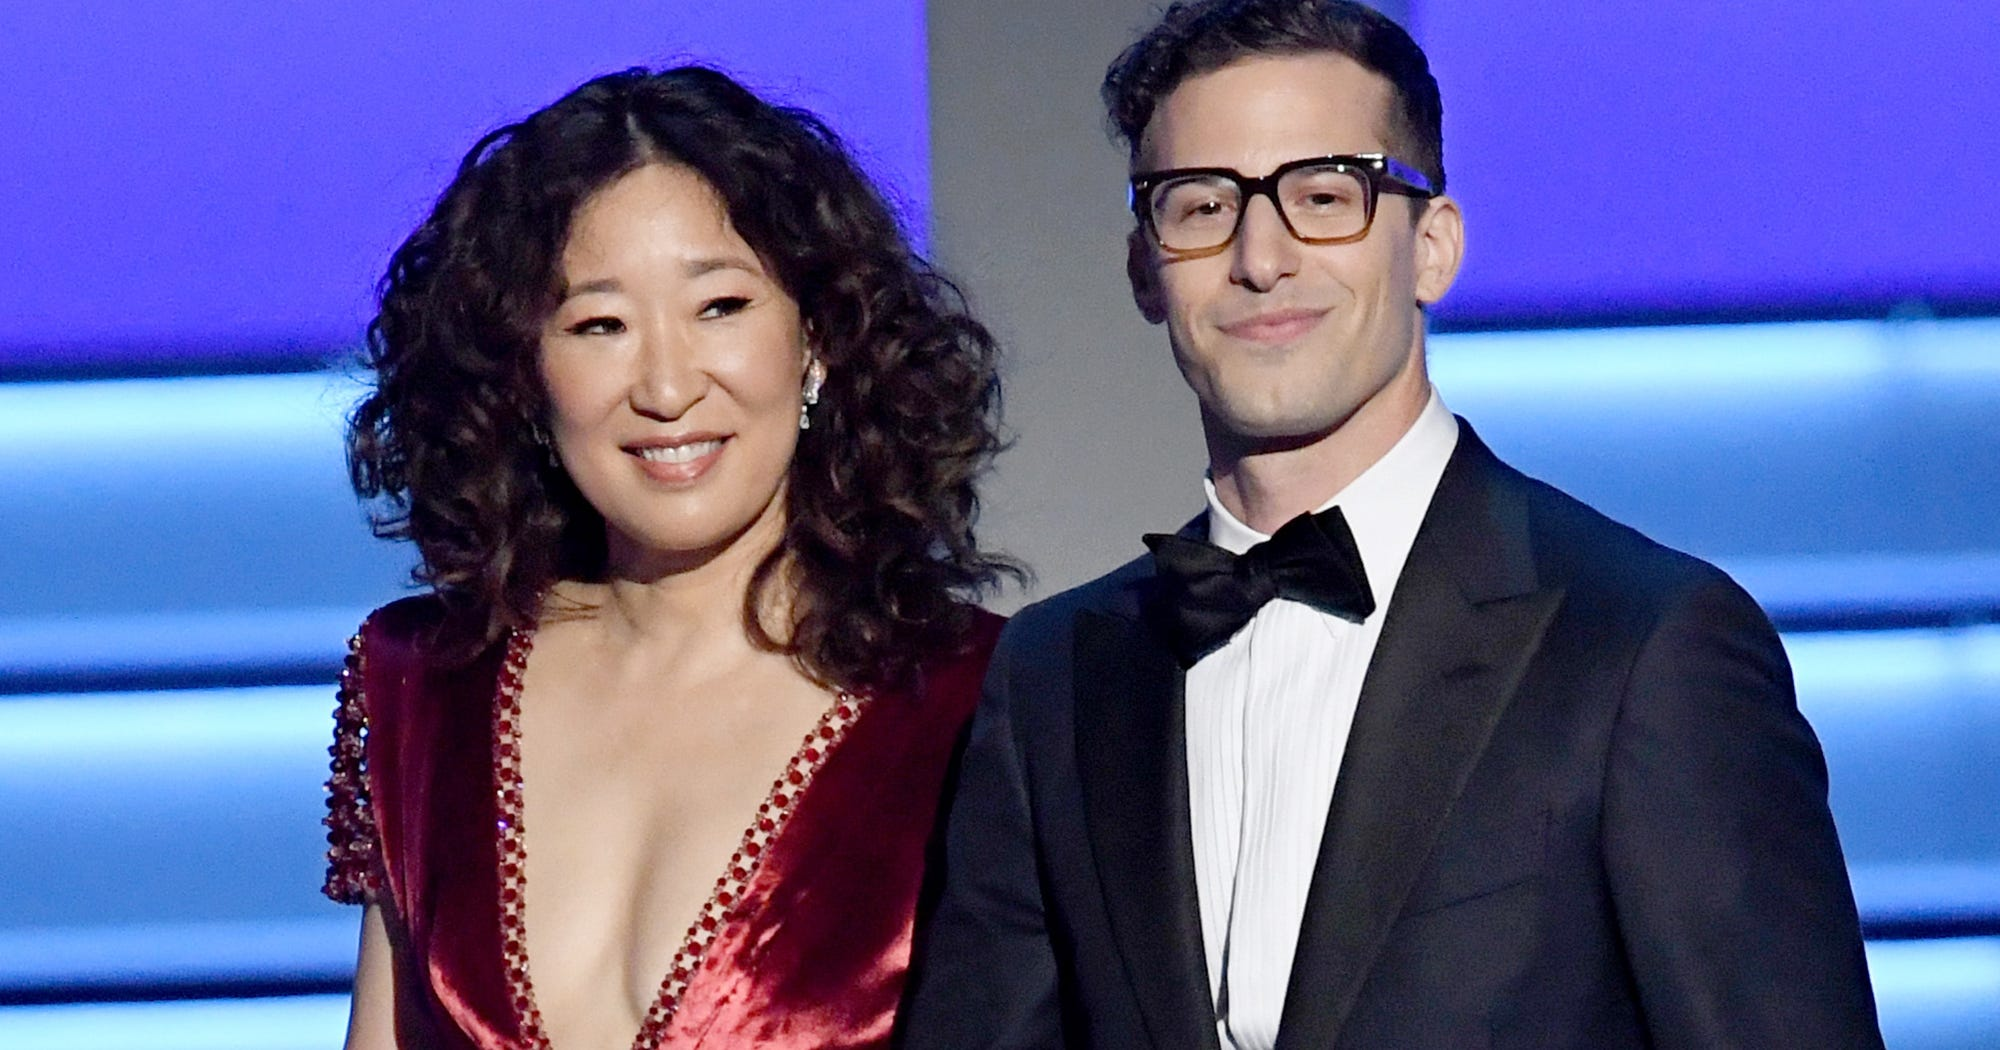 Sandra Oh & Andy Samberg Will Host The Golden Globes